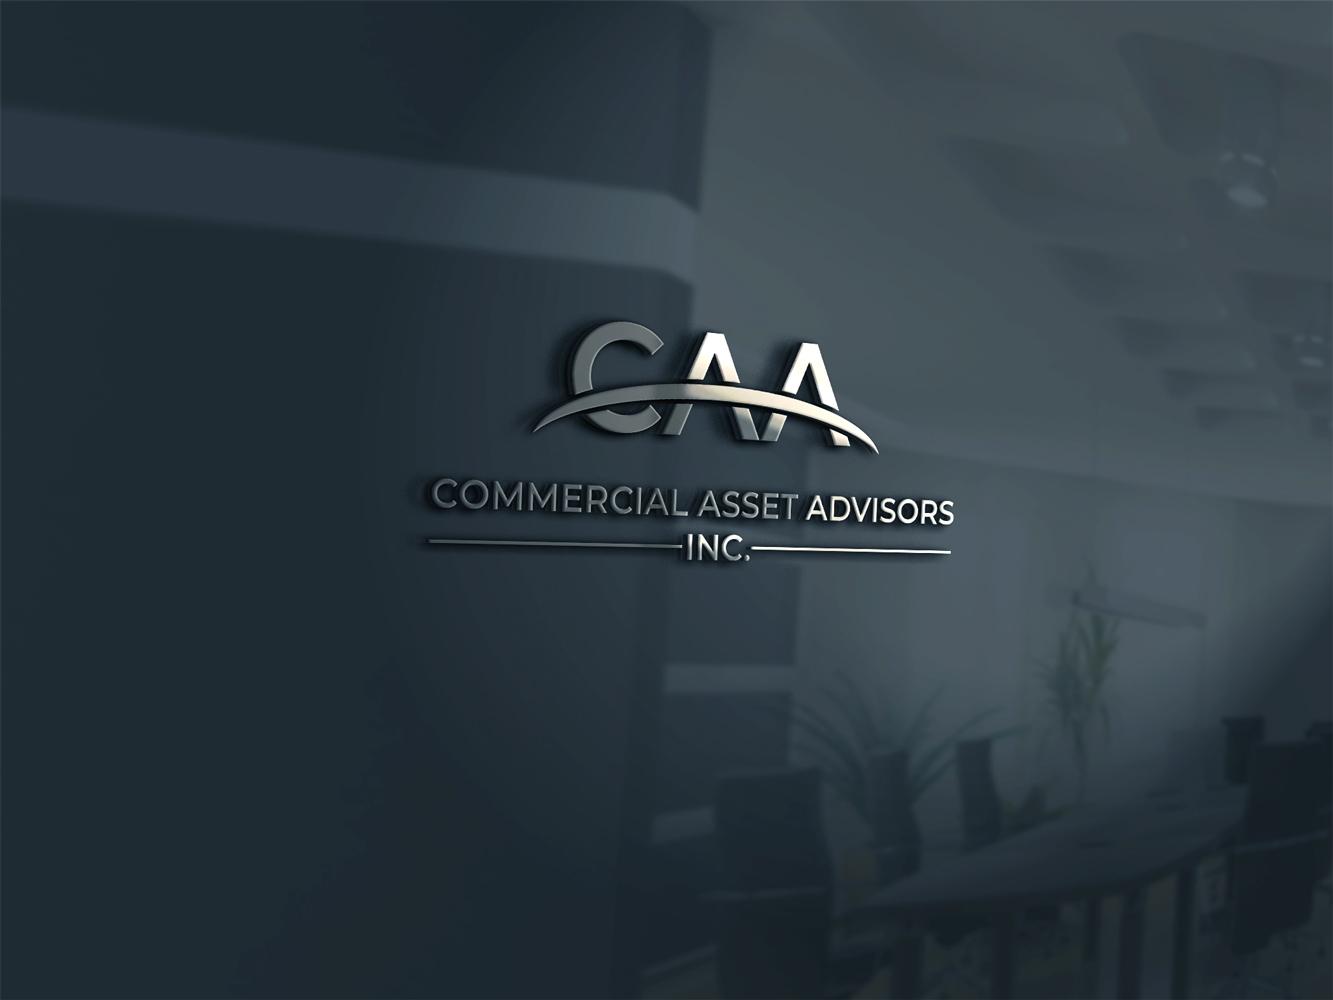 Winning Entry #98 for Logo Design contest - Create a logo for Commercial Assest Advisors, Inc. - original